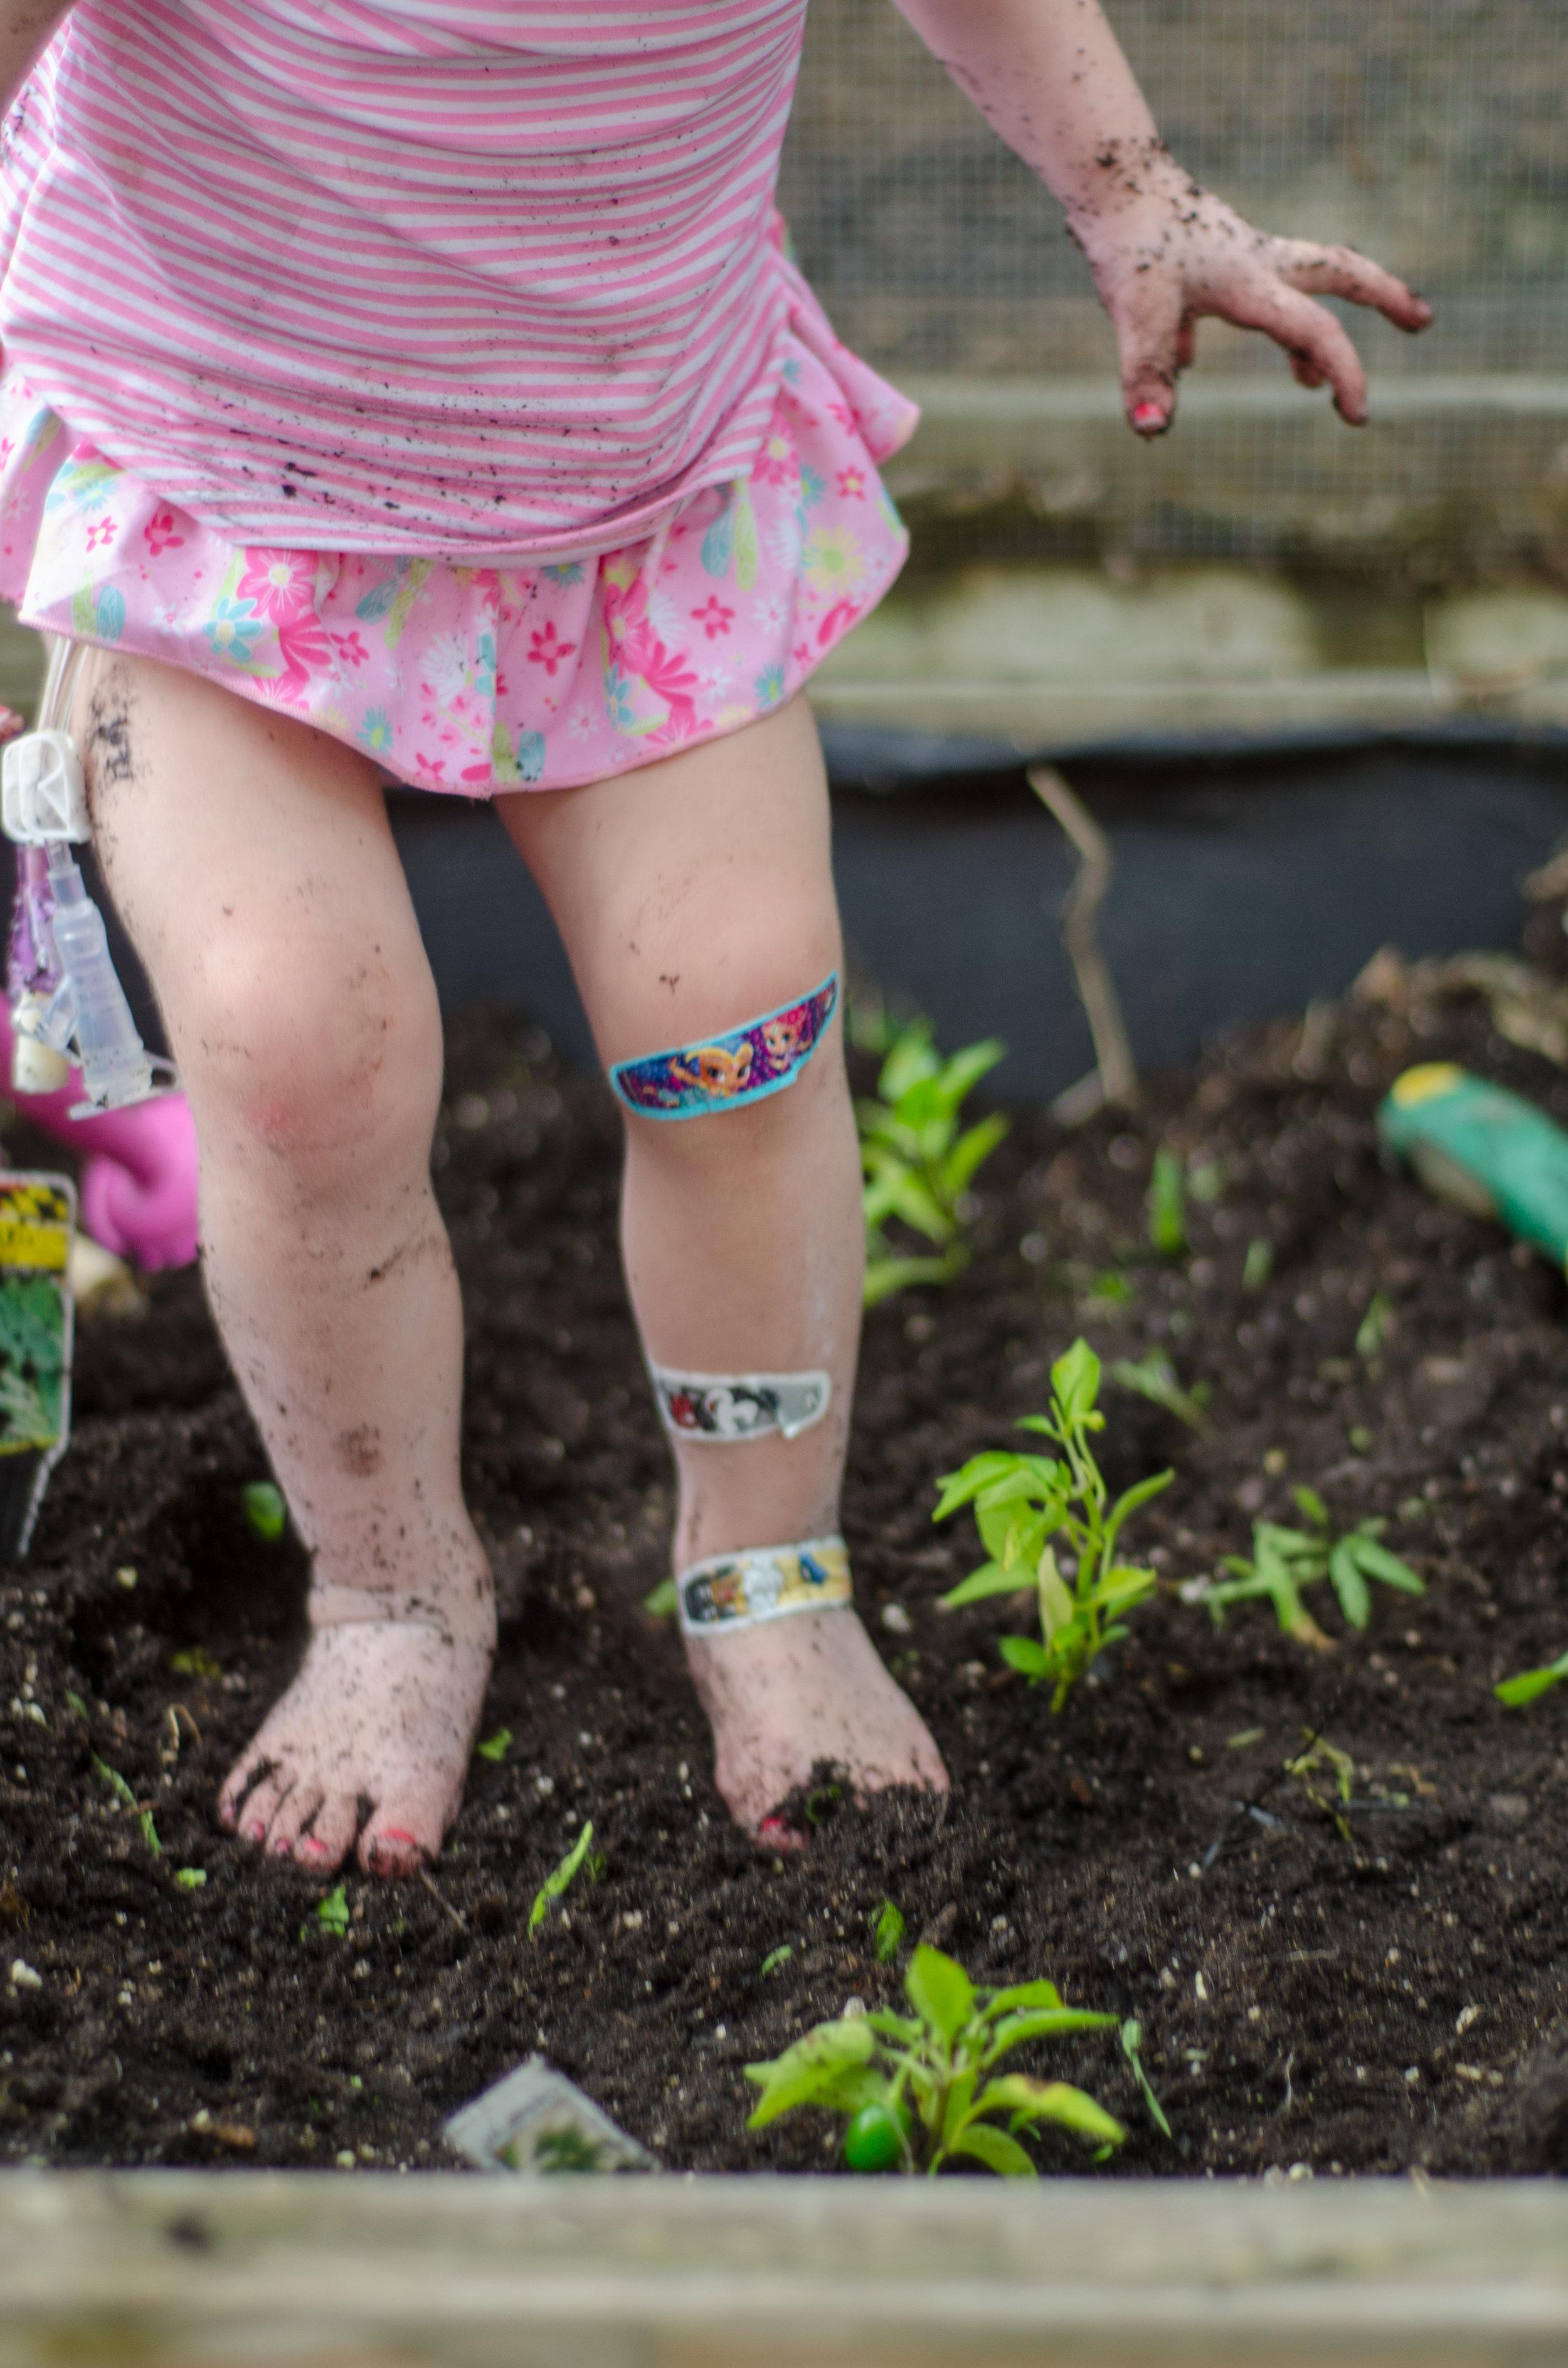 reasons to garden with your kids - iplay - shegotguts.com